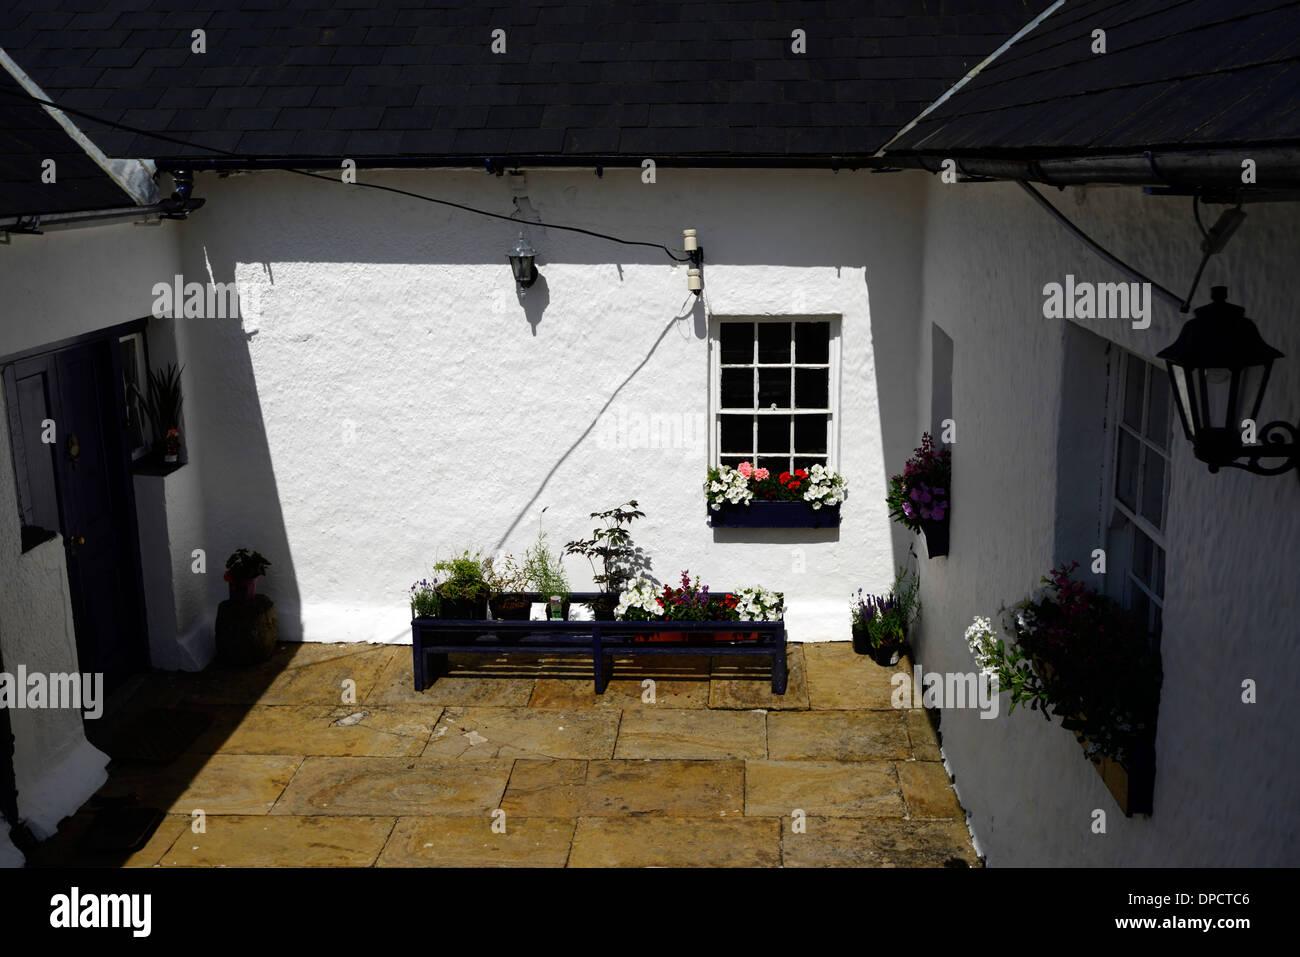 Hof gemalt weiße Wände Sonne Falle sonnige Terrasse Stockbild